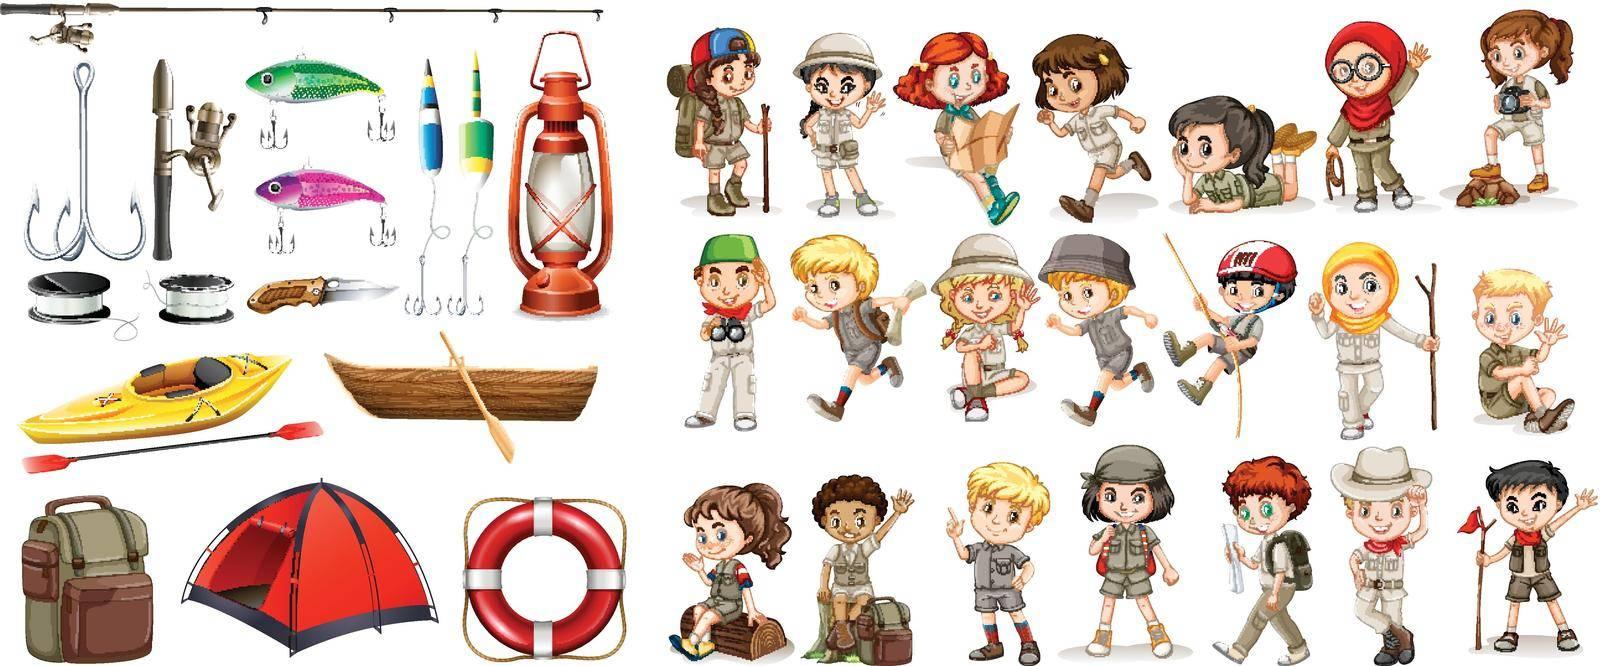 Children and camping equipment illustration